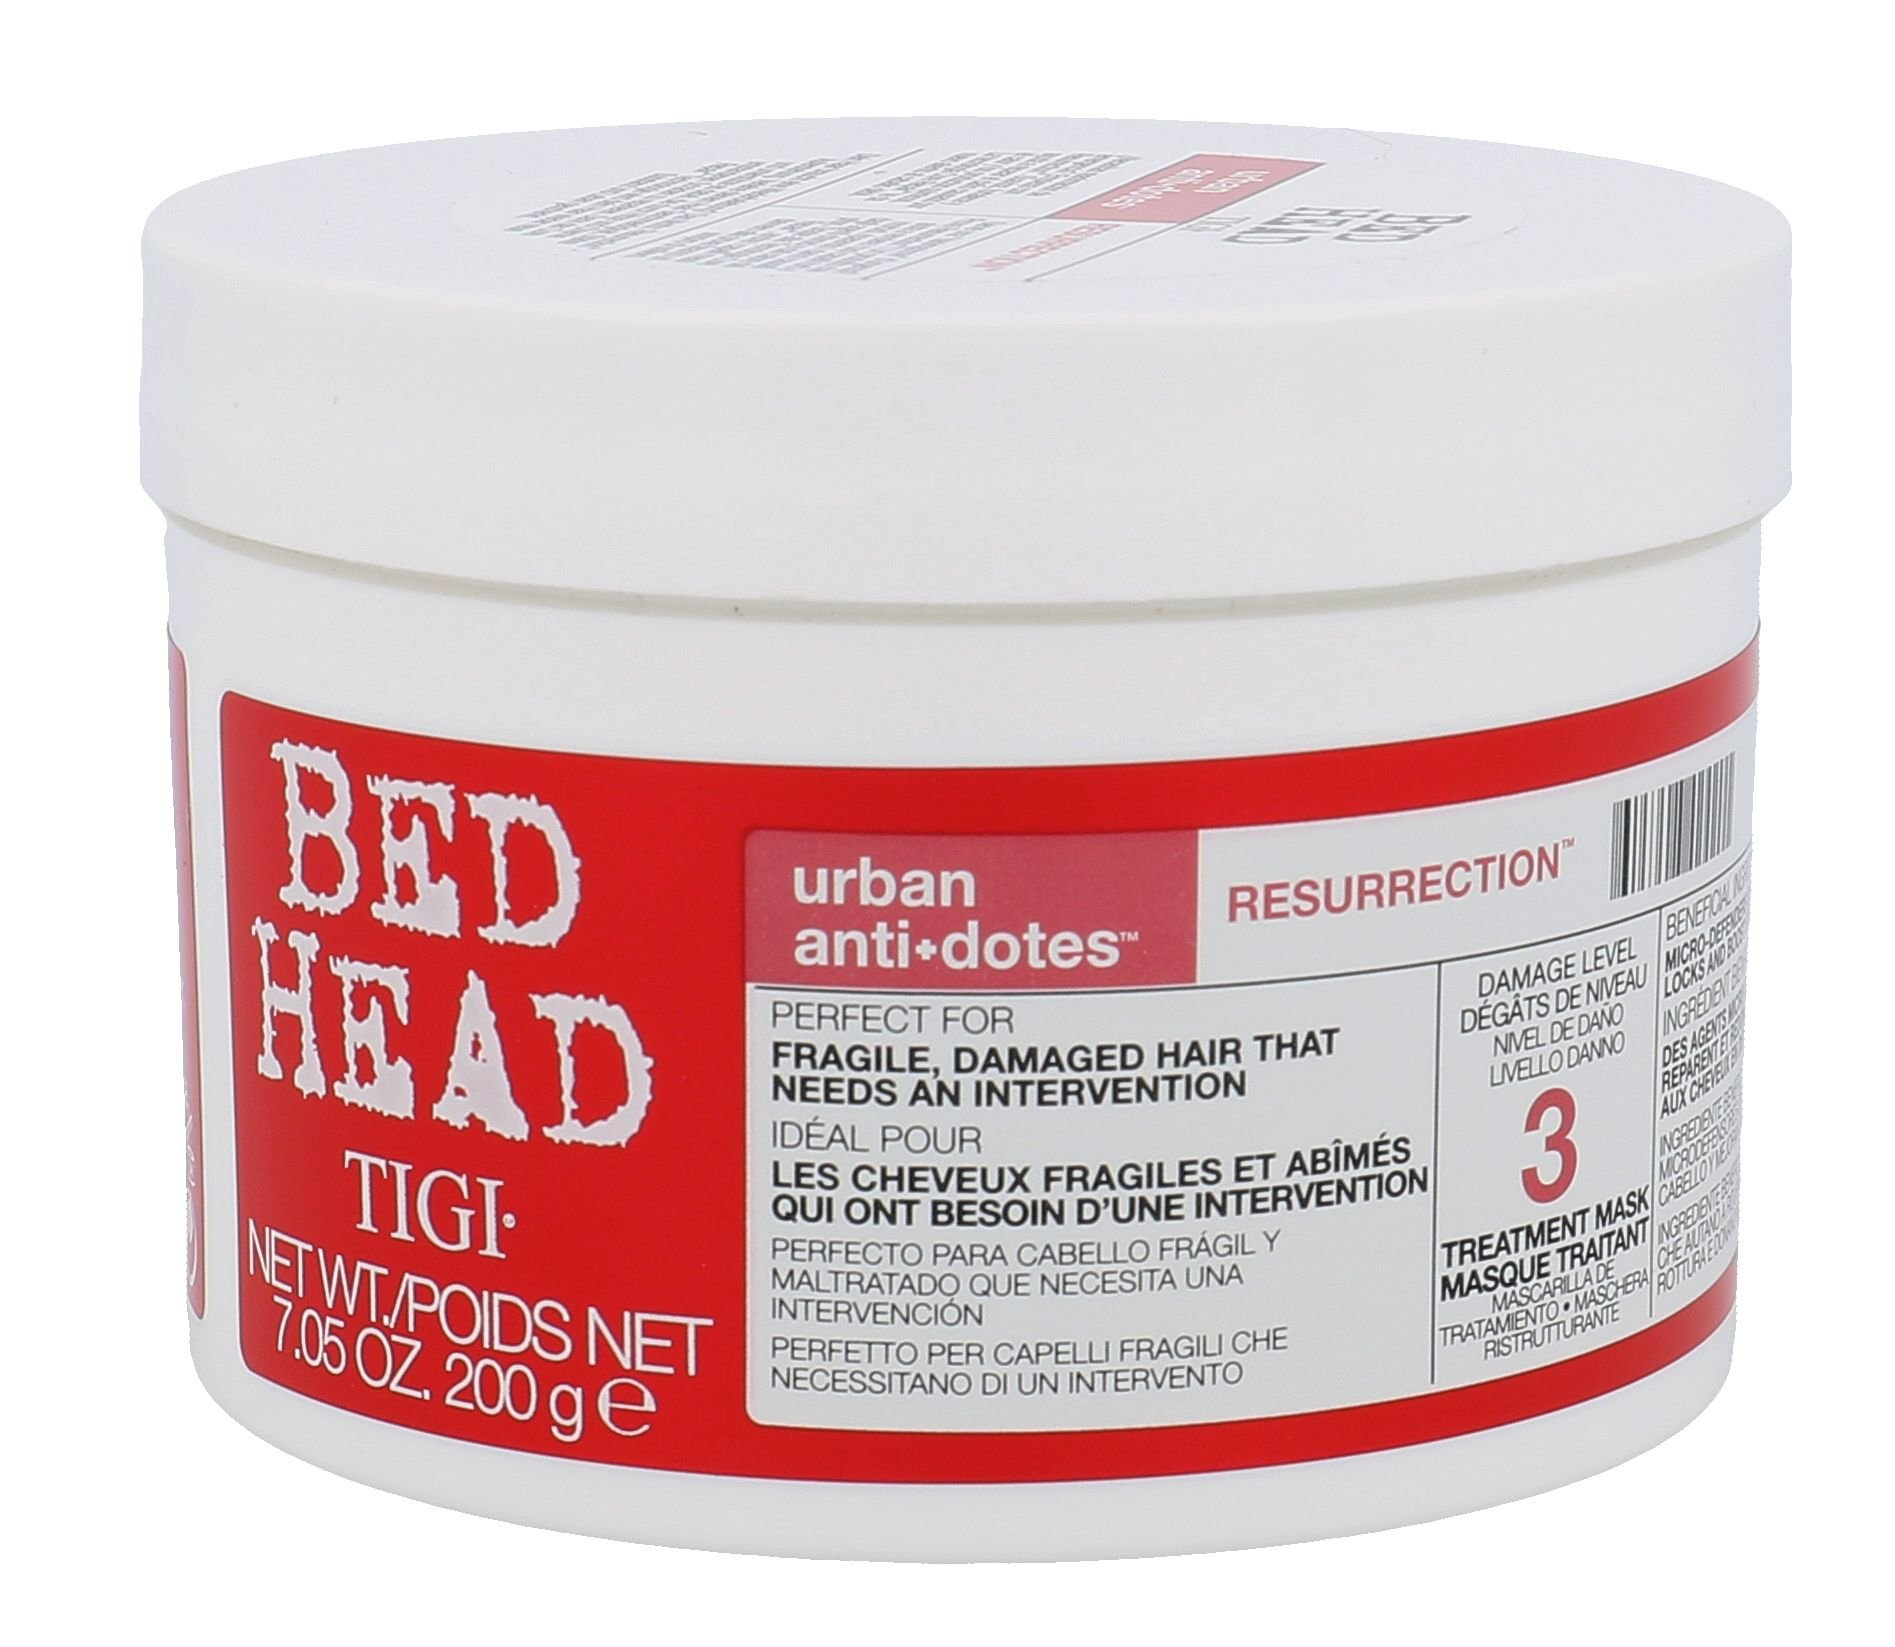 Tigi Bed Head Urban Antidotes Resurrection Mask Cosmetic 200g